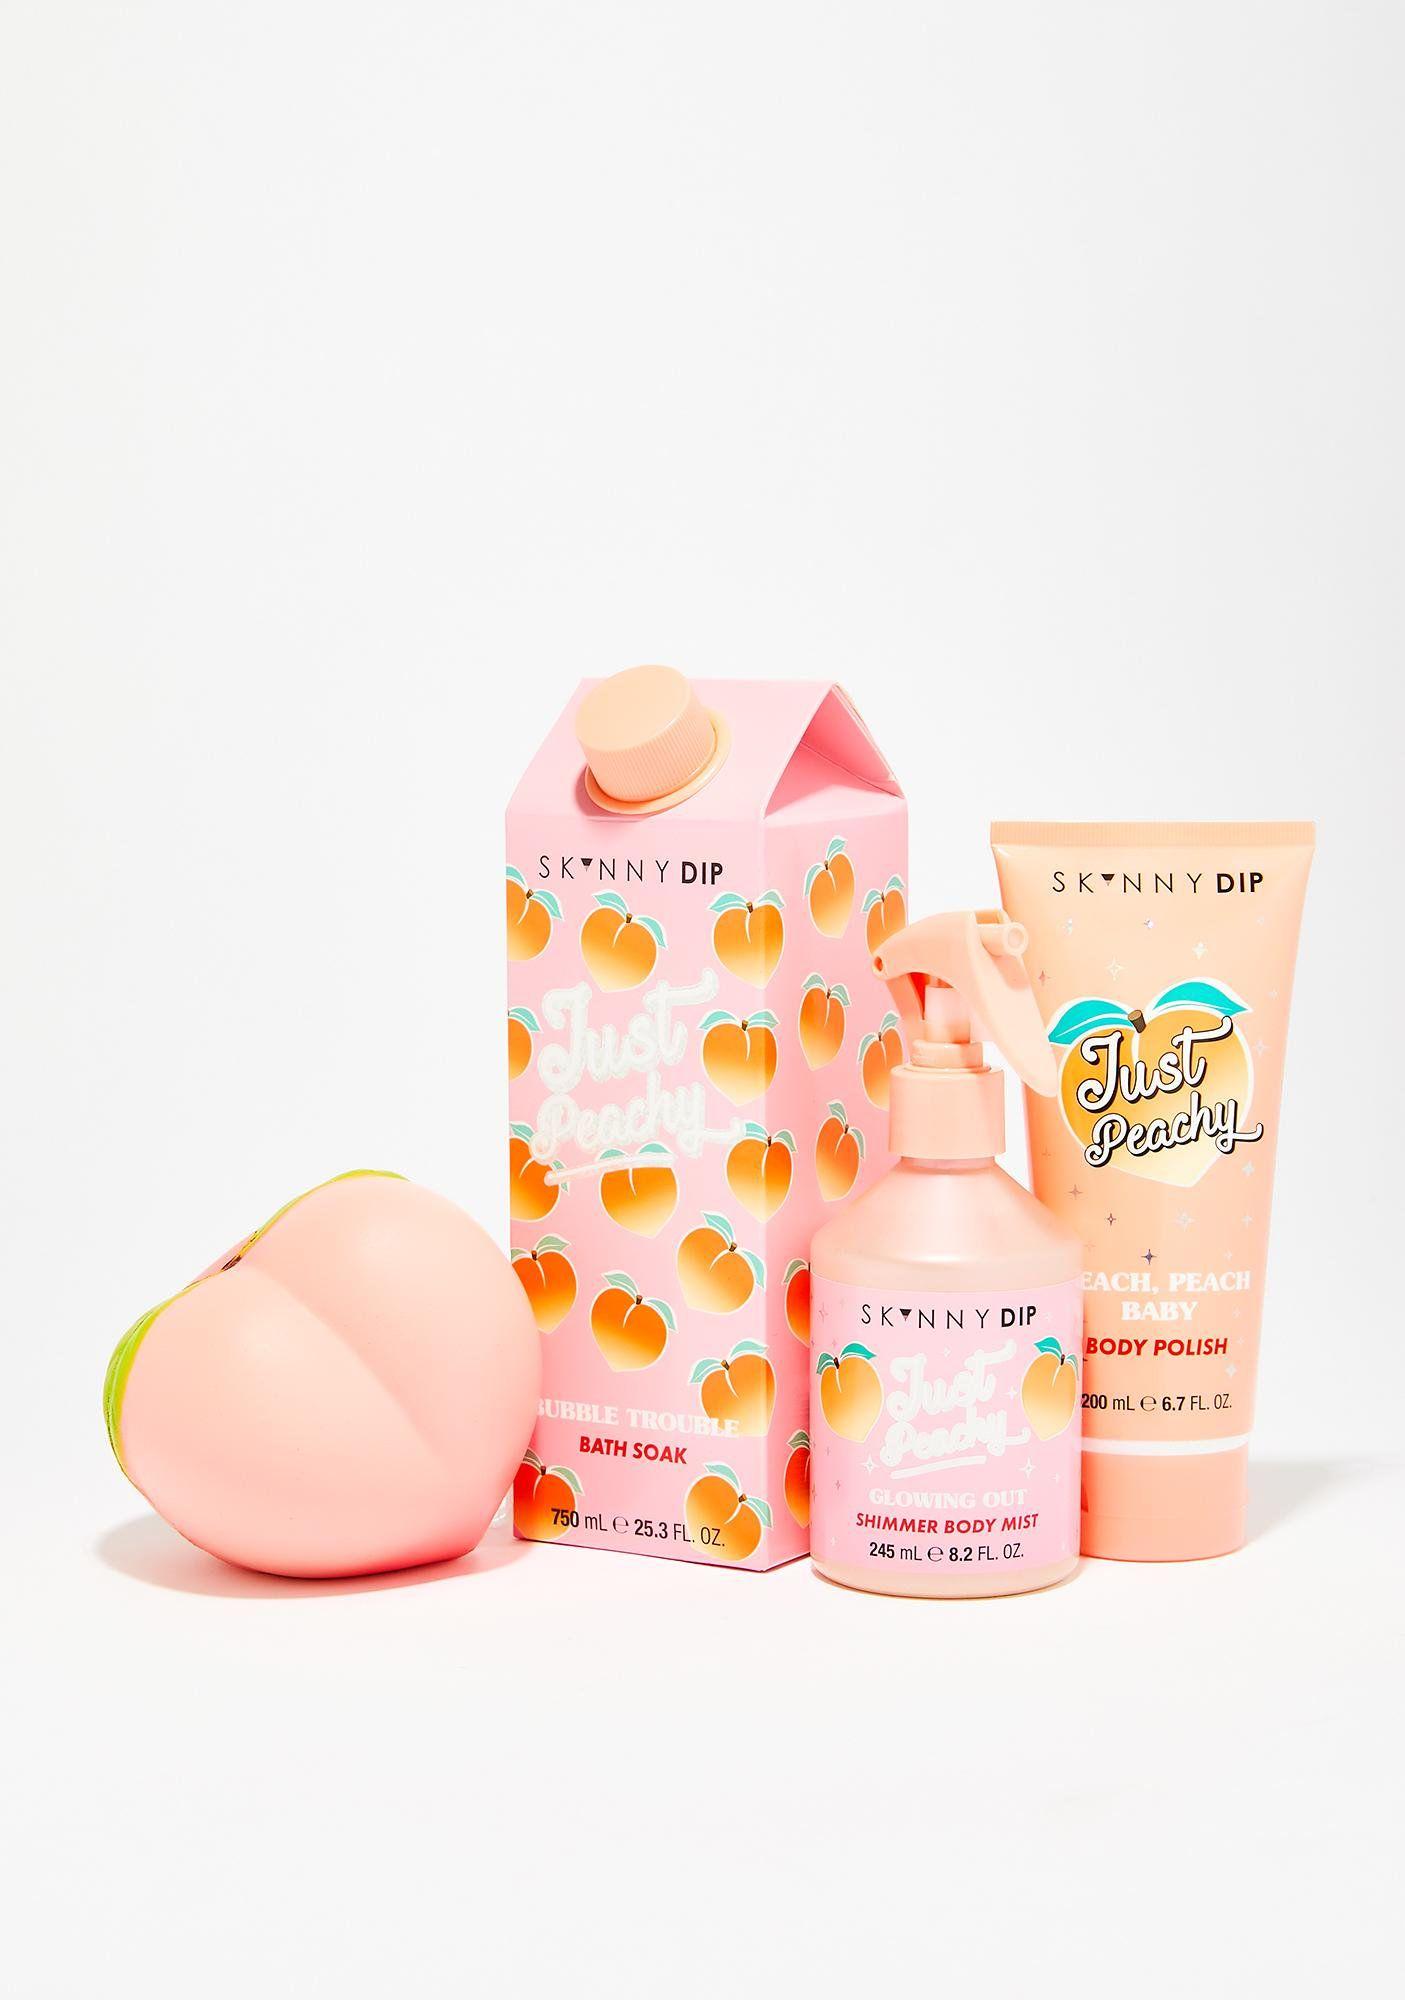 Skinnydip Just Peachy Bath Soak Peachy Bath Soak Just Peachy